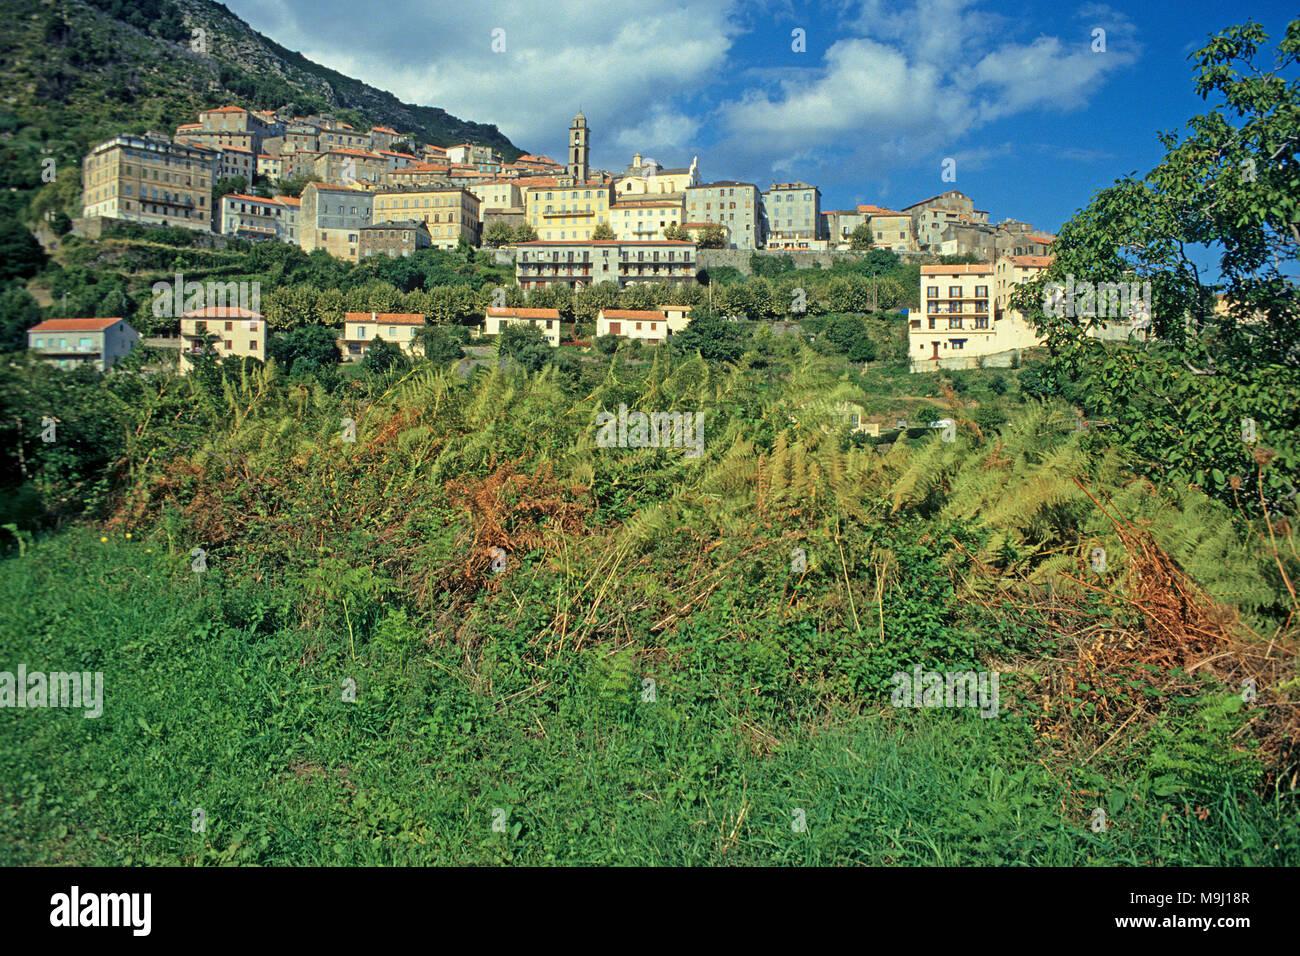 The picturesque mountain village Cervione, Corsica, France, Mediterranean sea, Europe - Stock Image